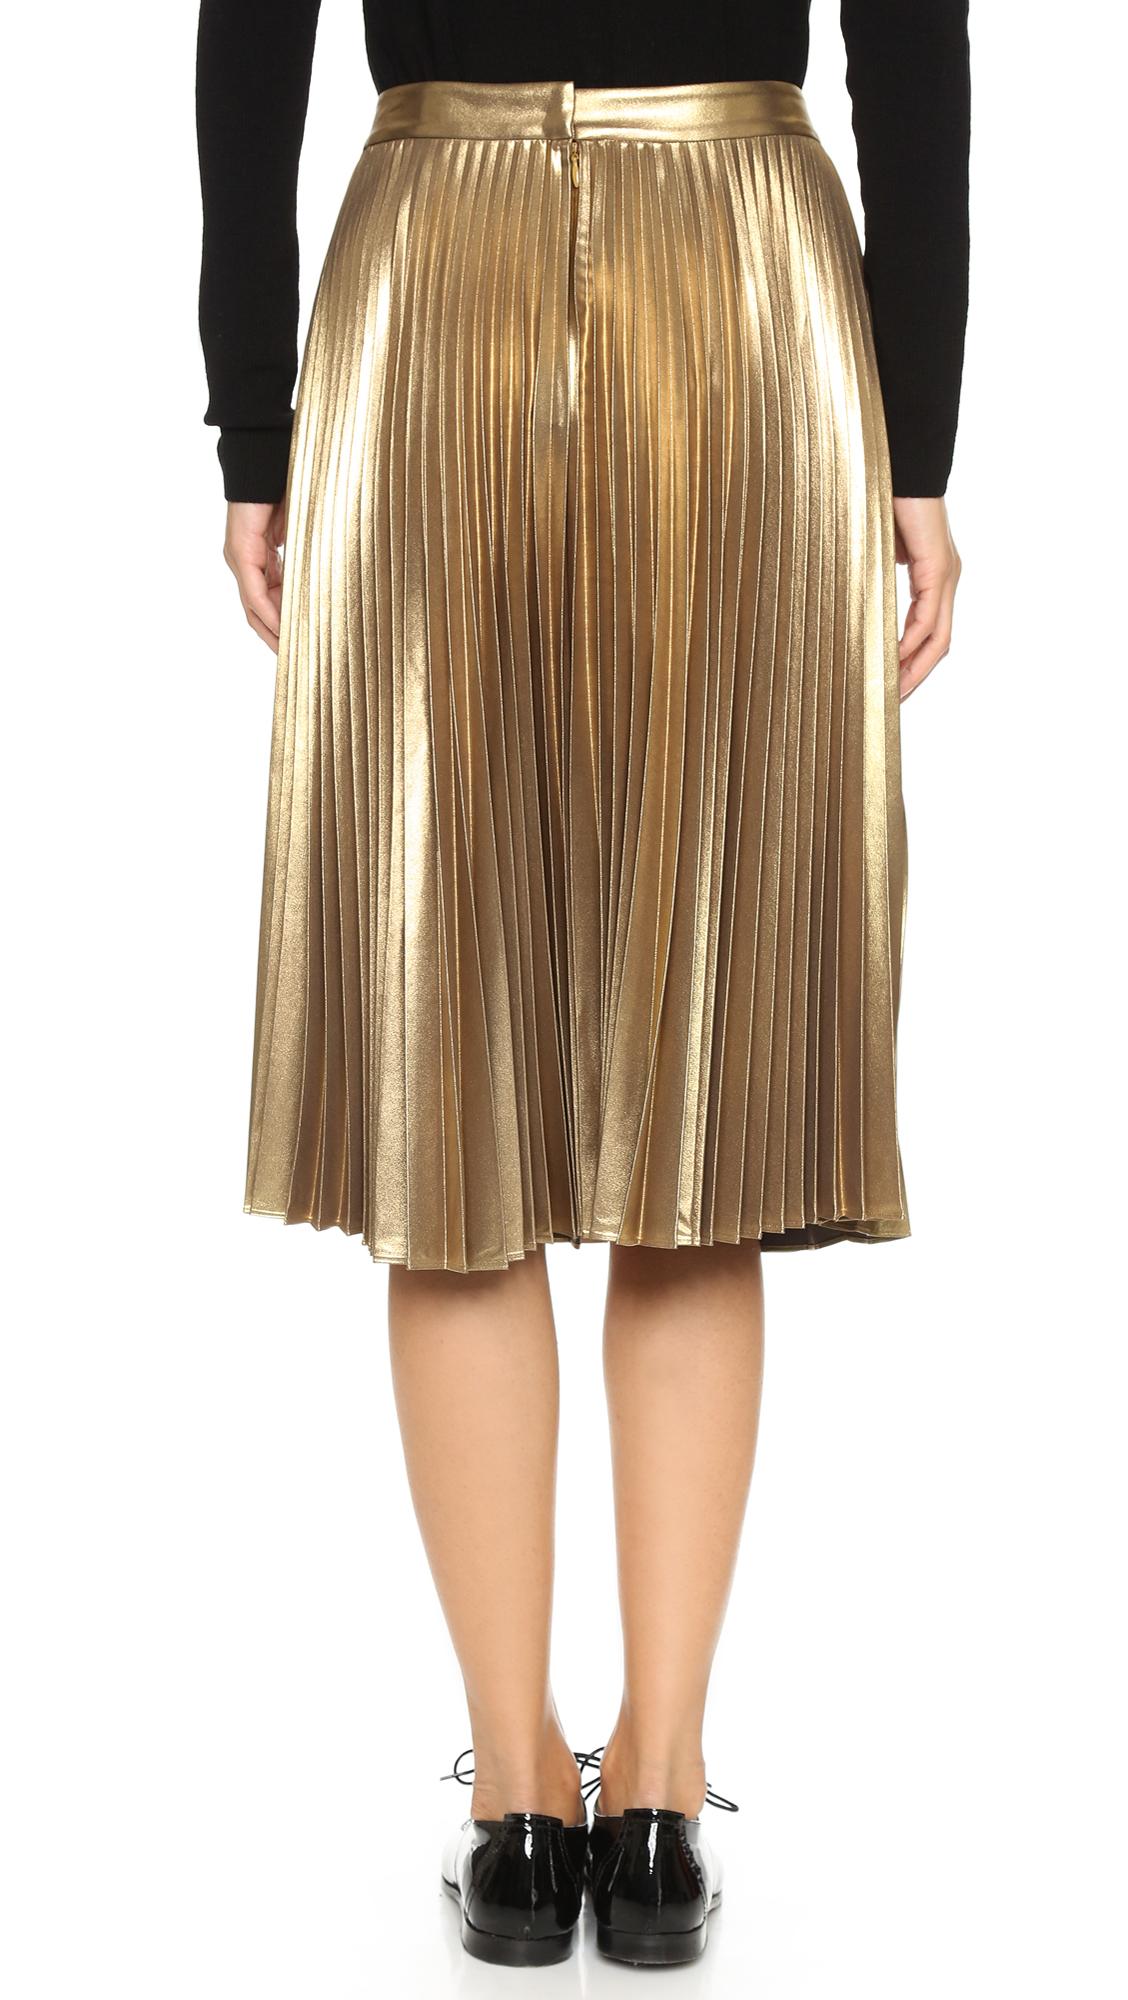 A.L.C. Gates Skirt - Gold in Metallic